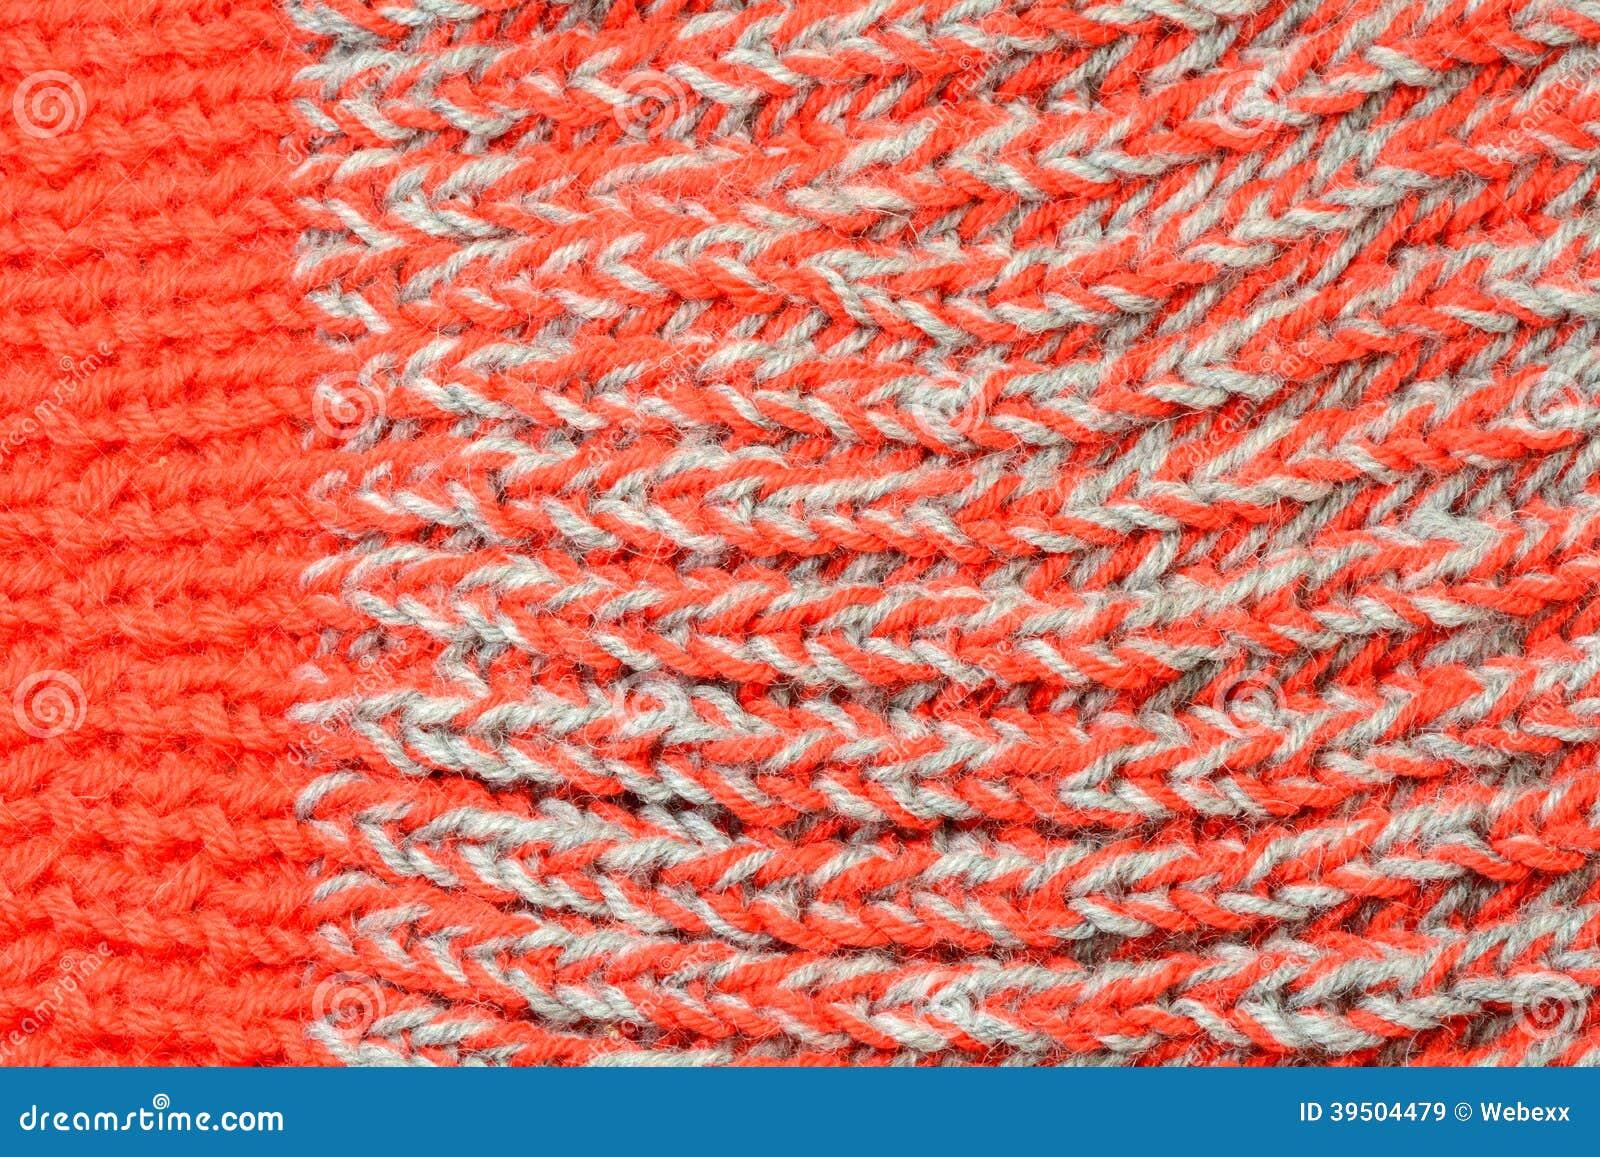 Homemade Knitwear